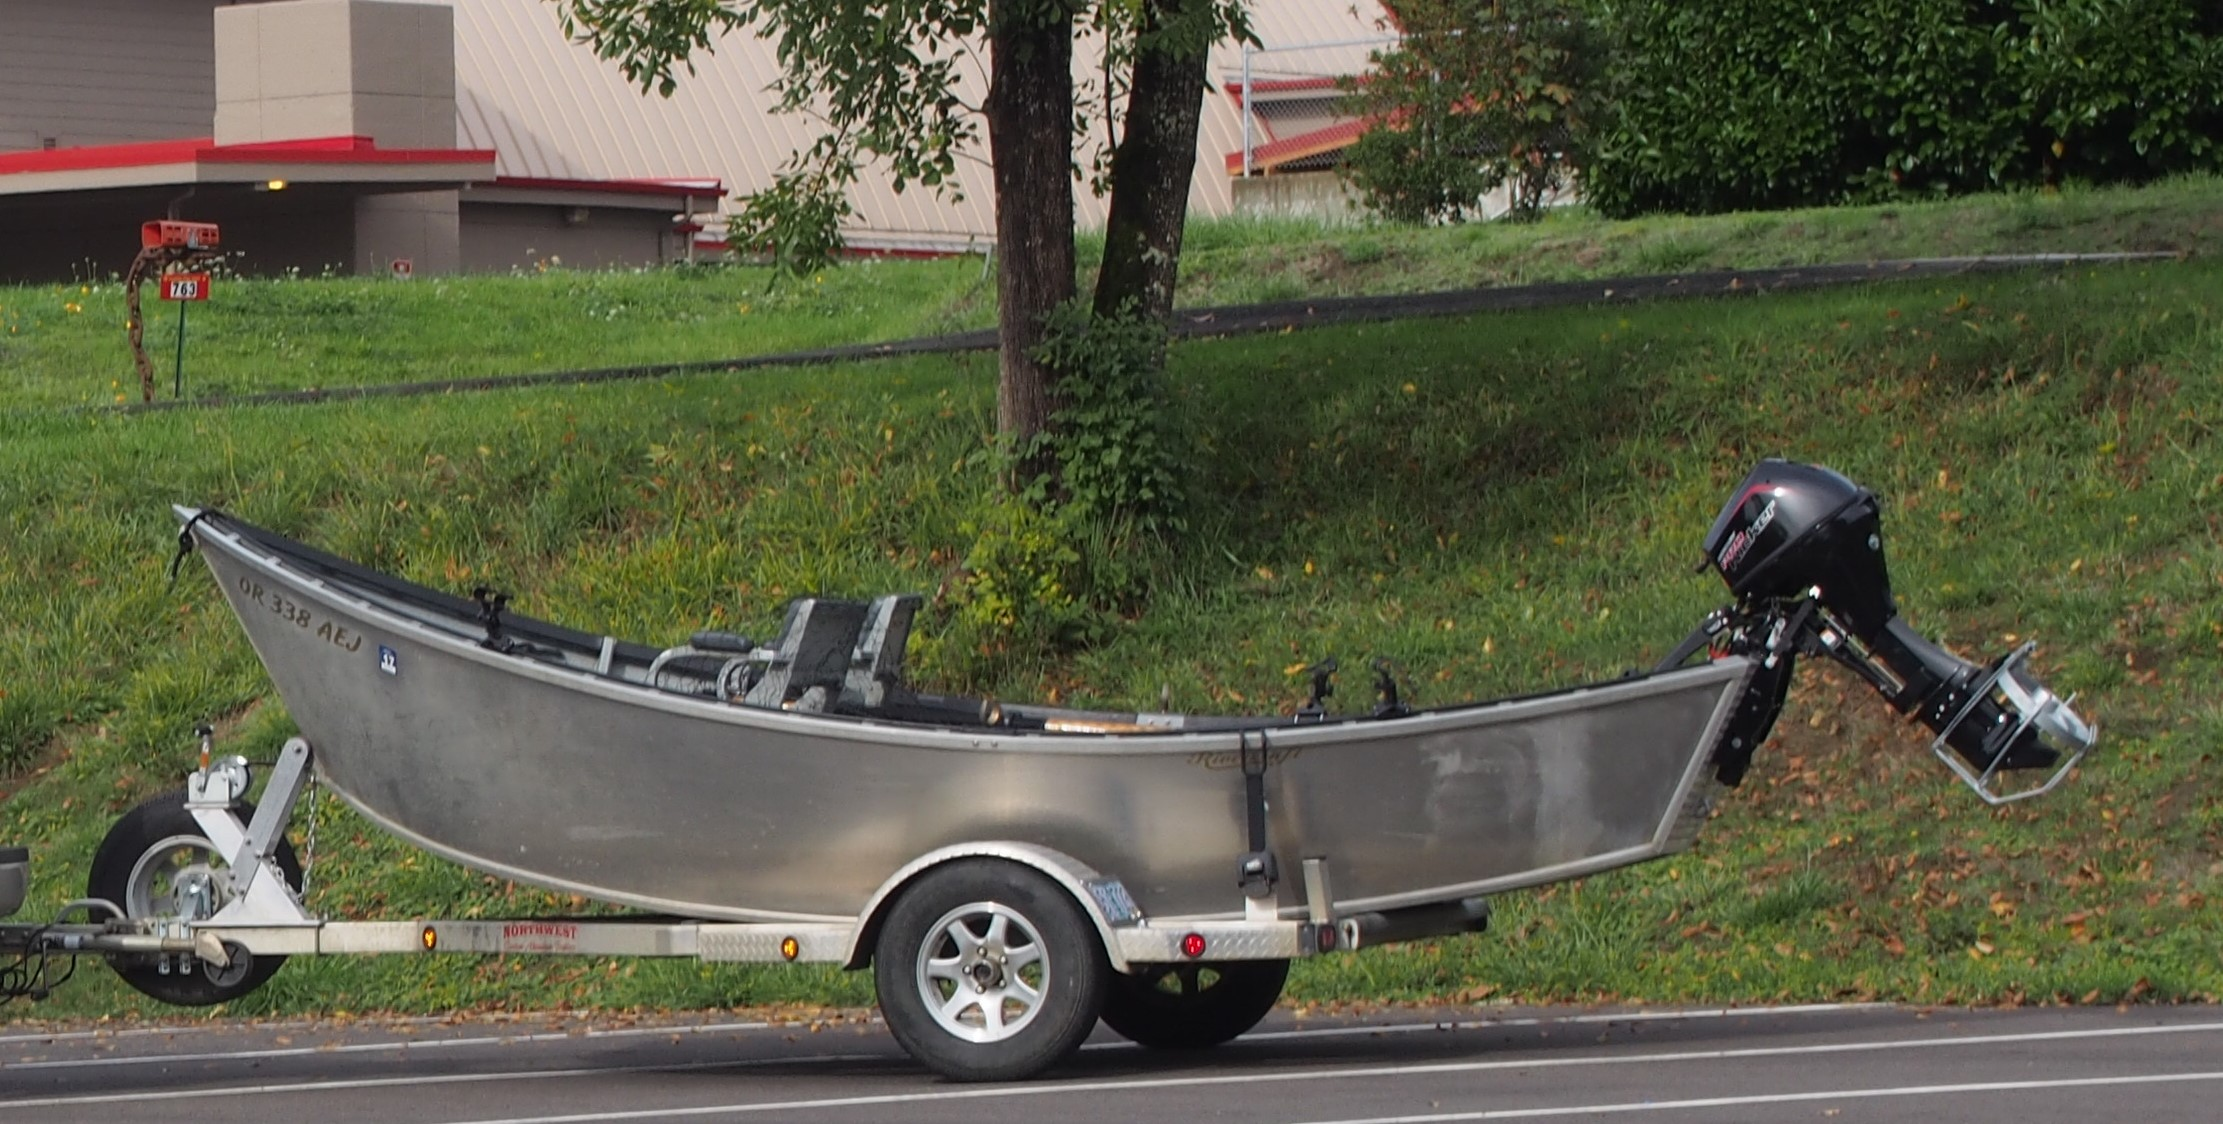 2012- 16 x 60 Rivercraft Drift Boat $7,000.00 - Willie Boats